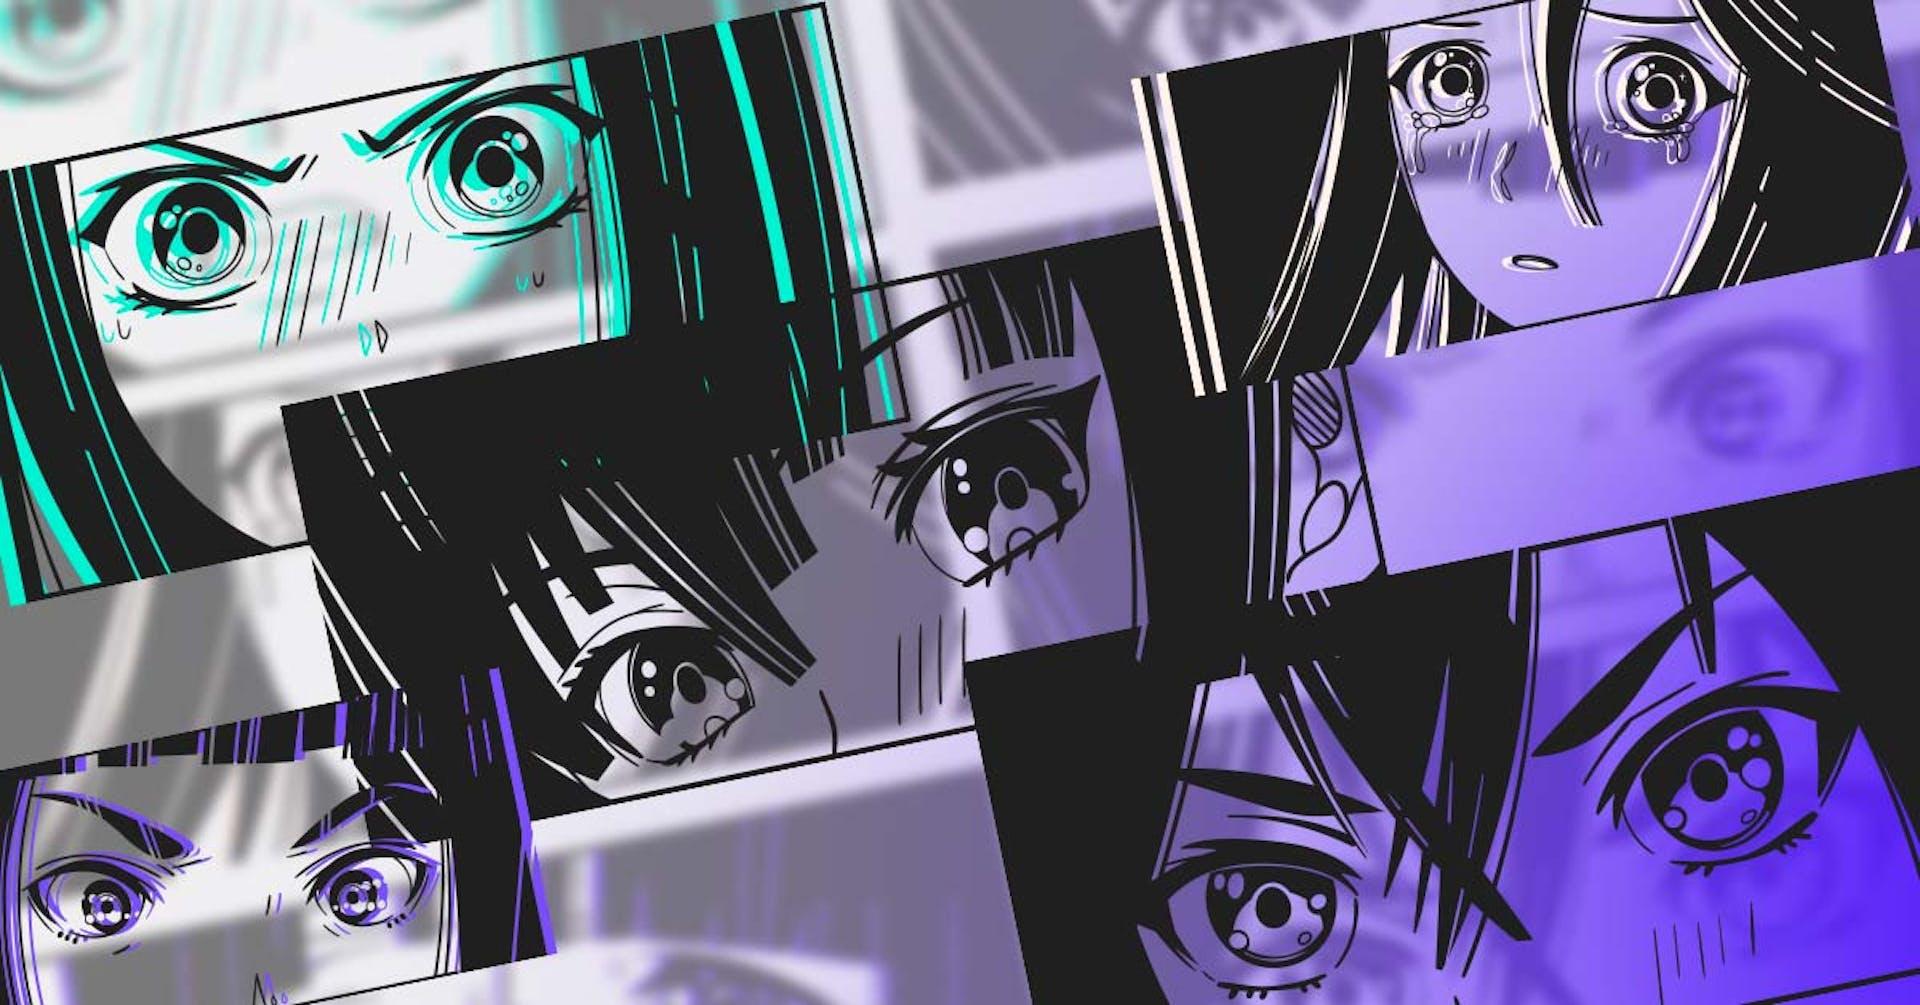 Aprende cómo dibujar ojos manga y crea miradas cautivantes para tus personajes